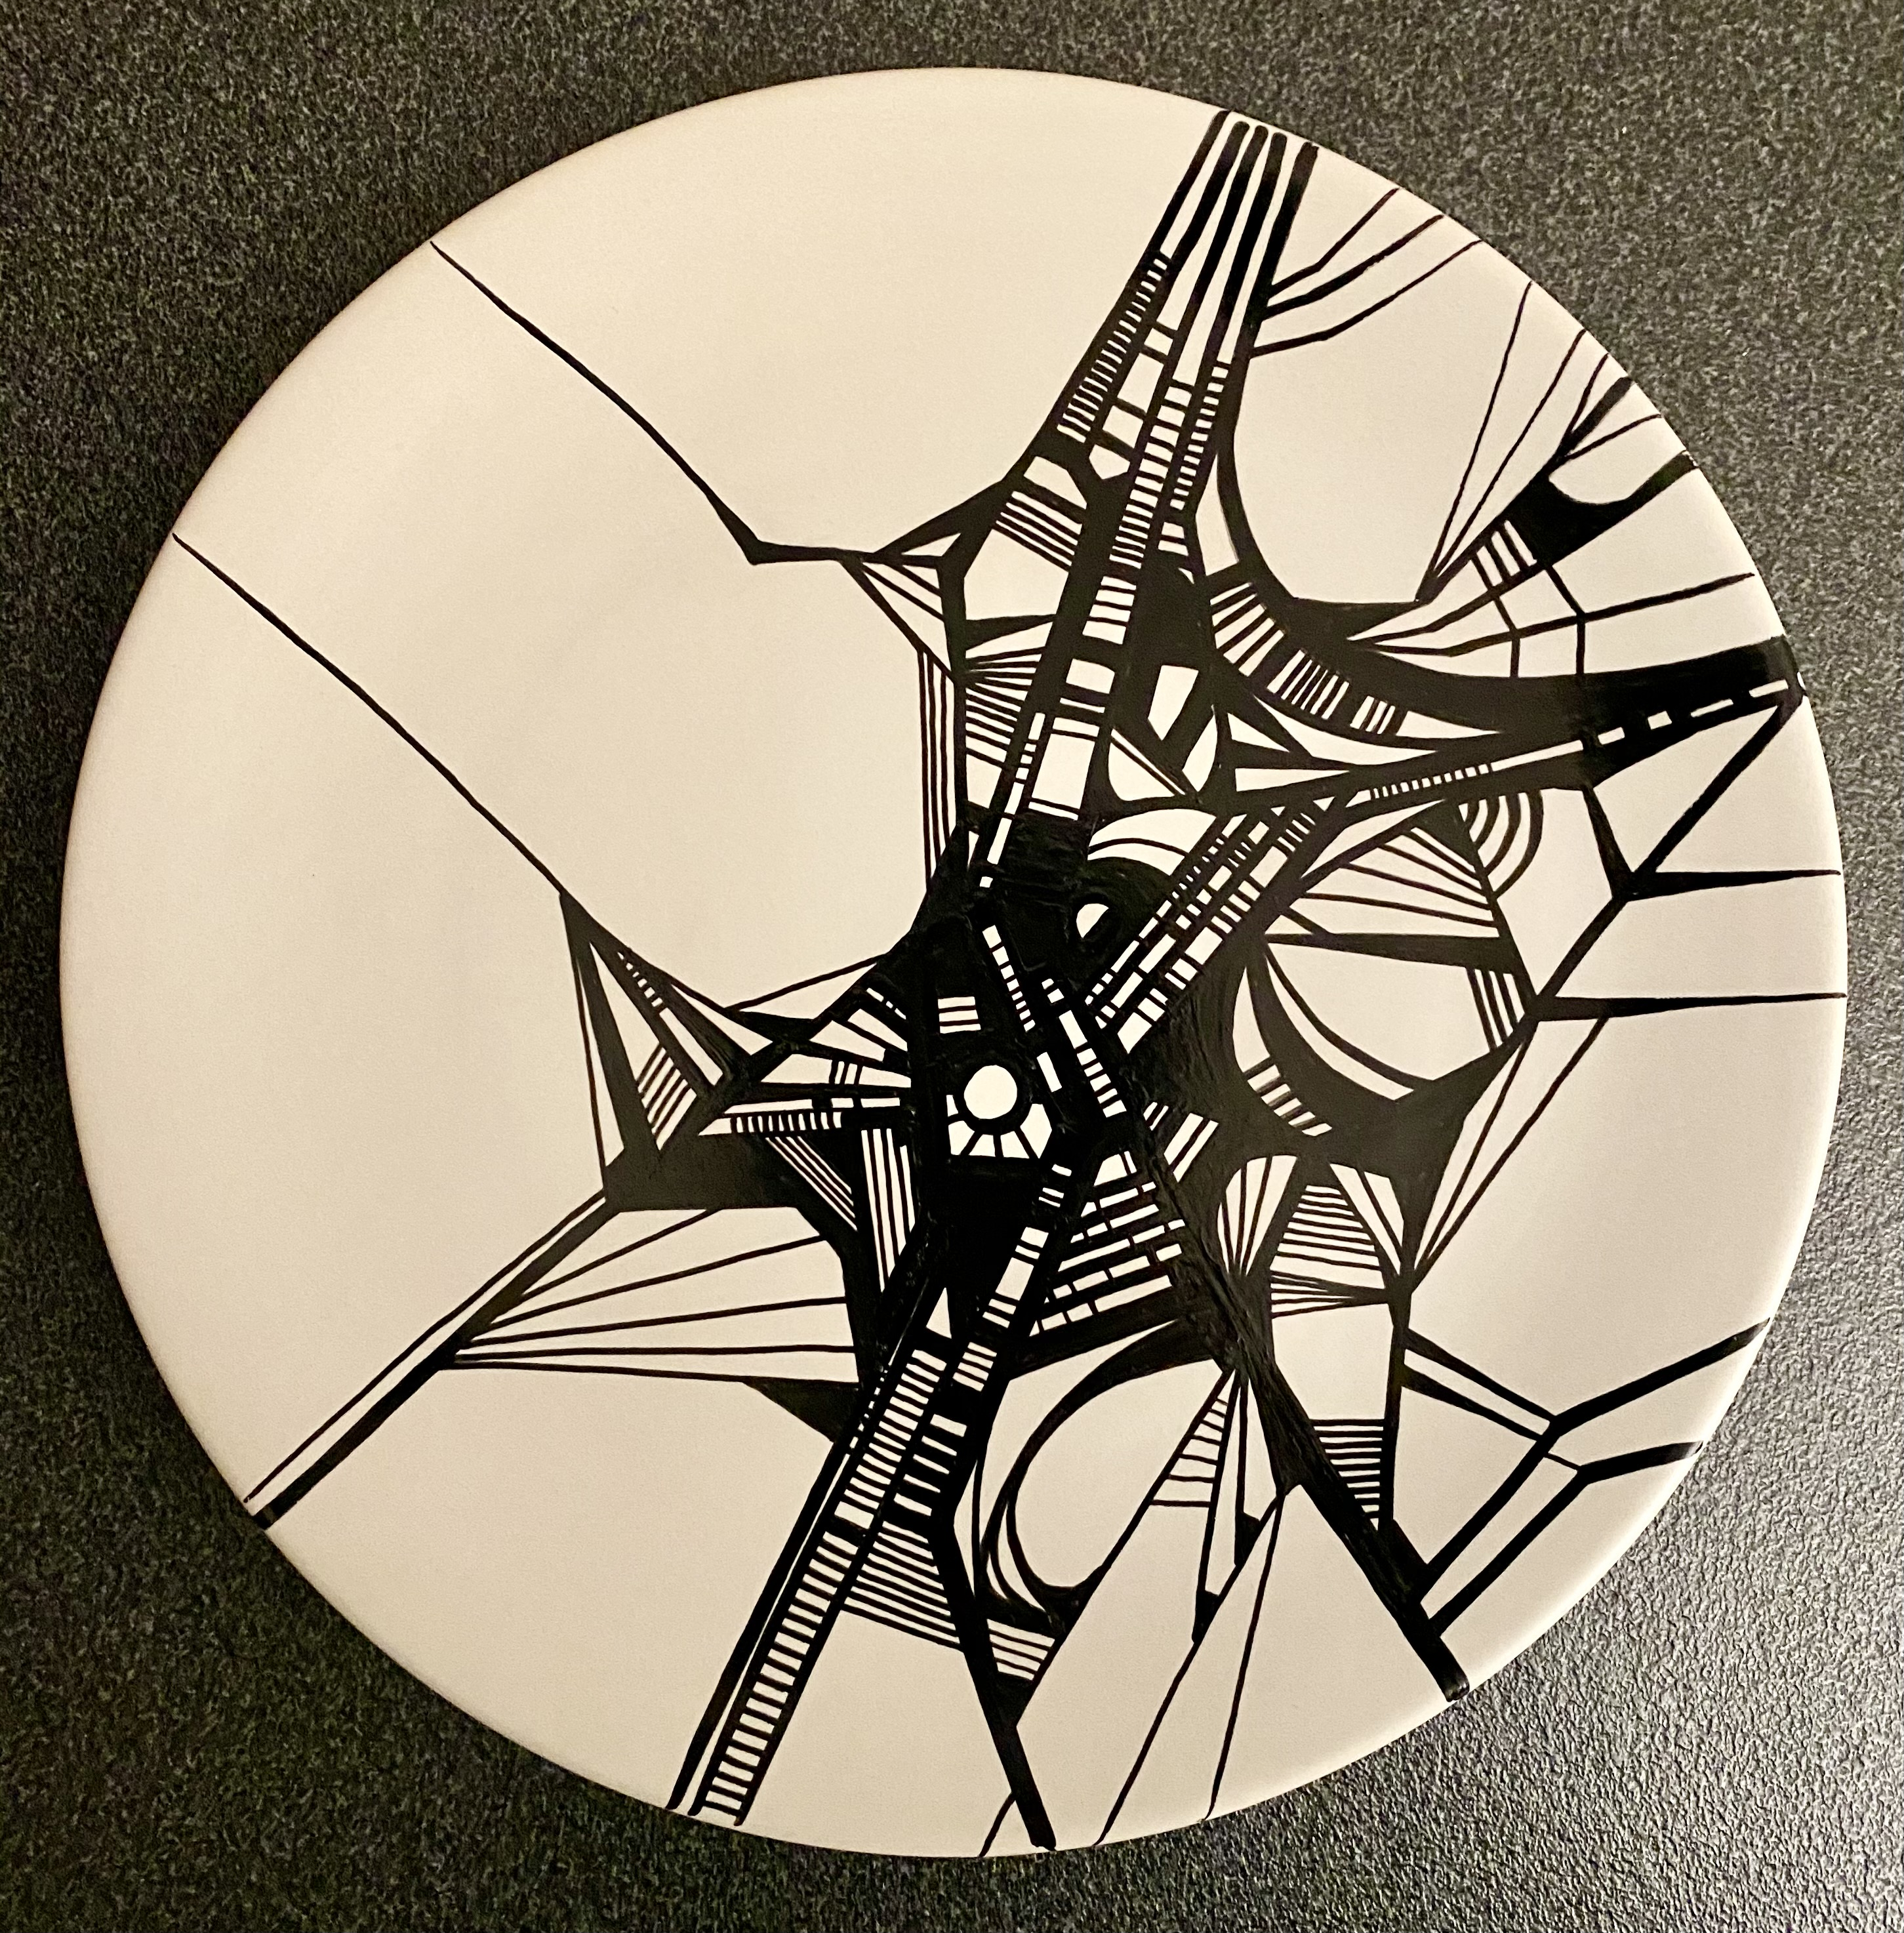 PIATTO diametro 22cm - 2020_5